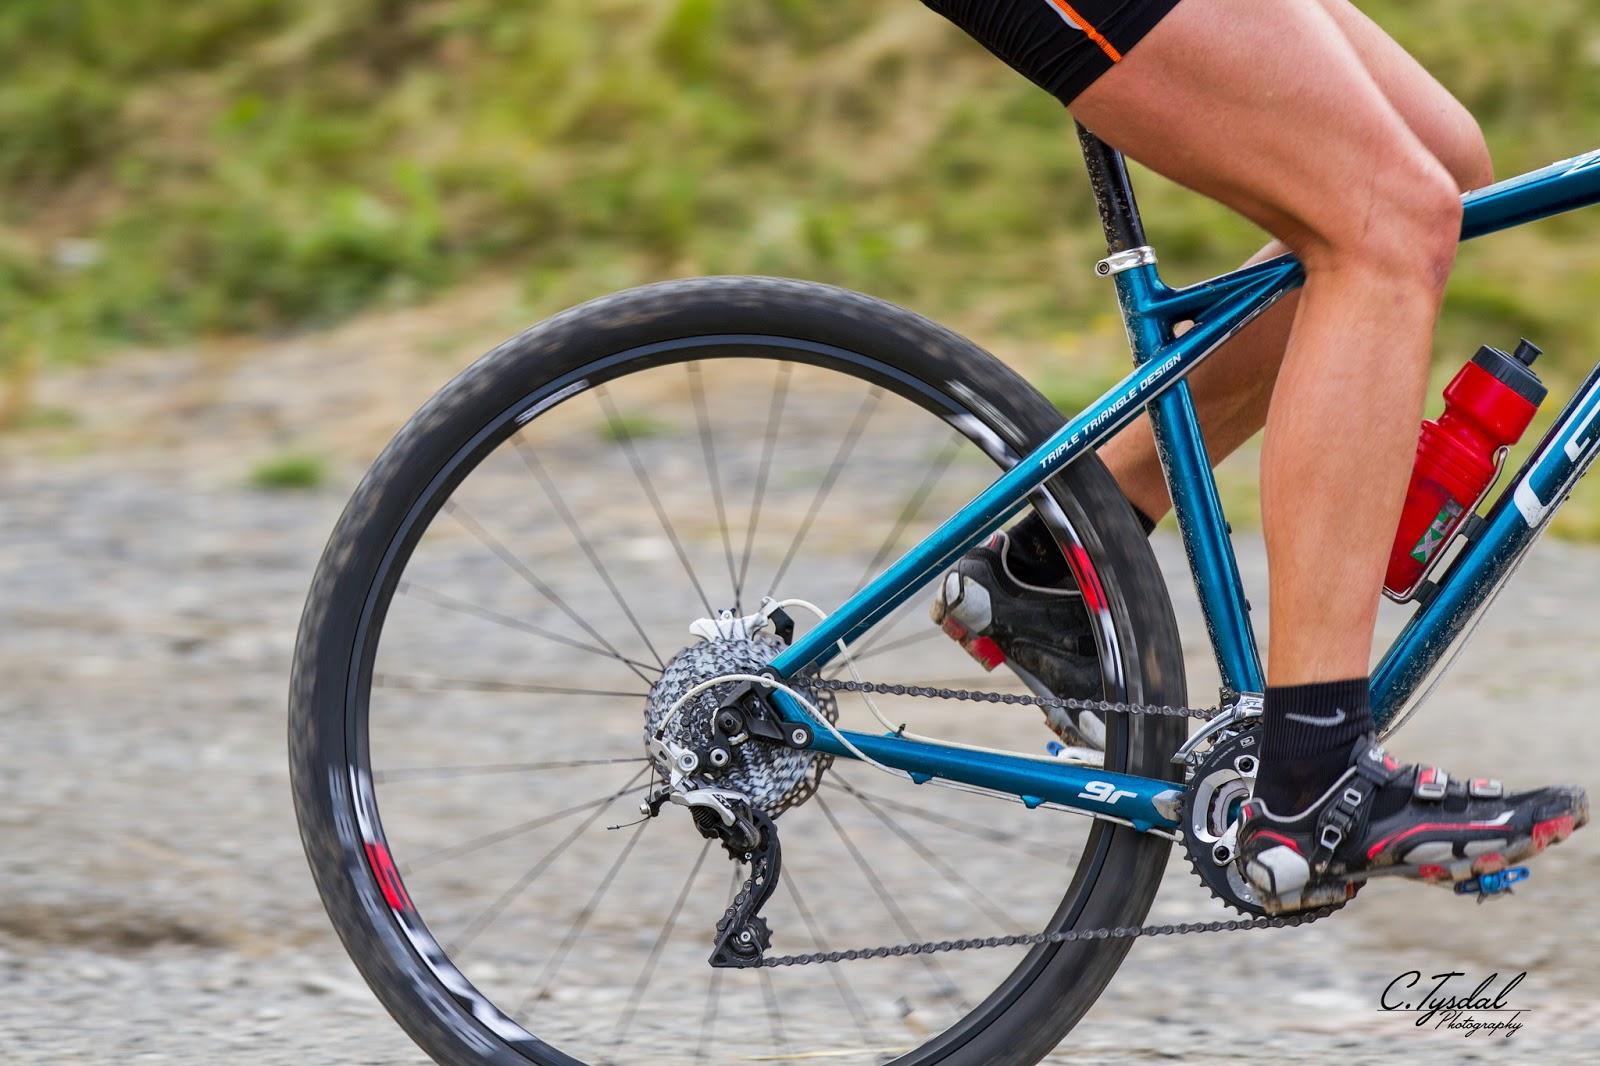 Sykkelhjul i fart